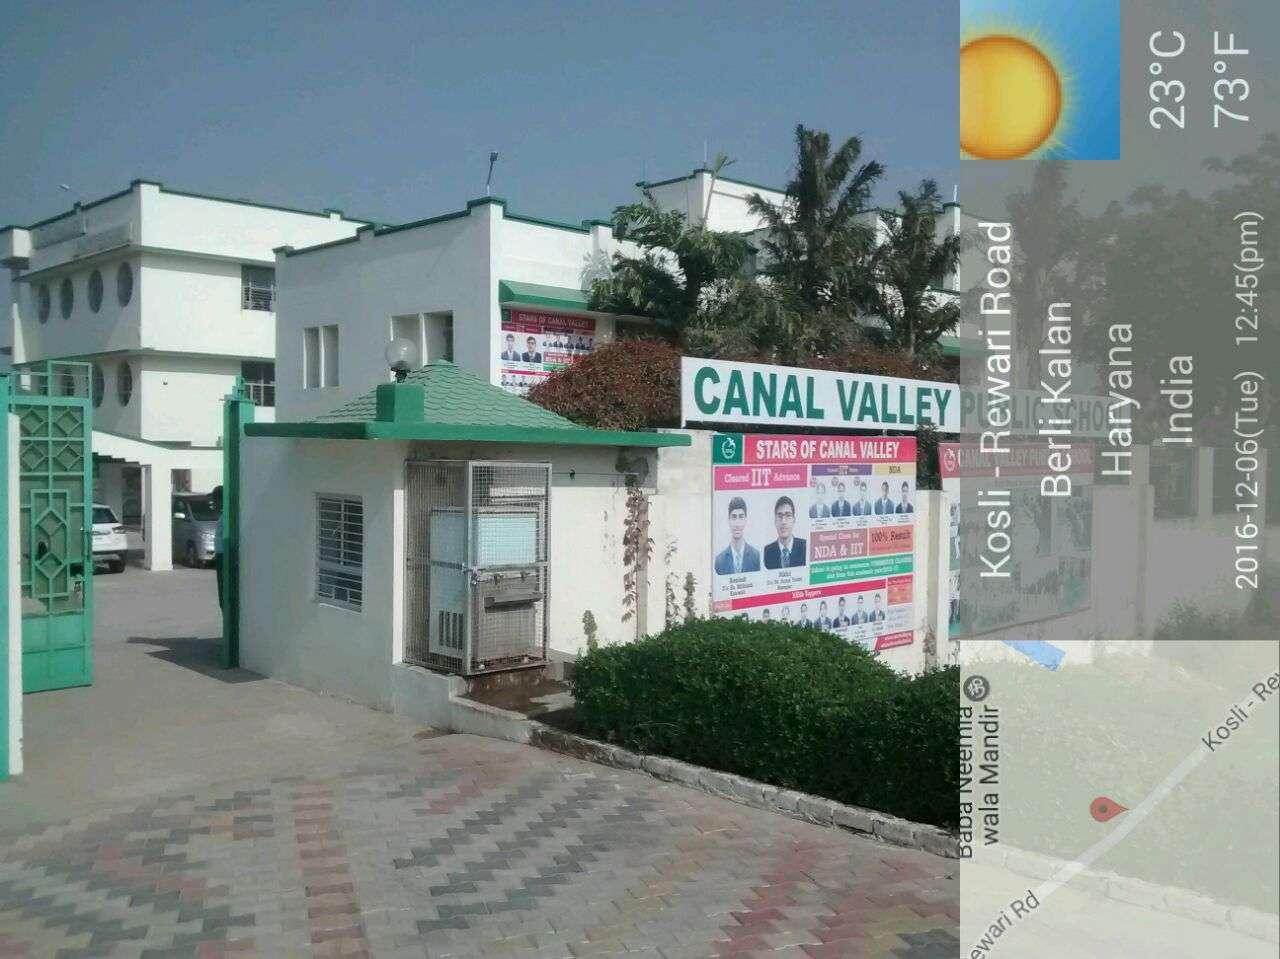 CANAL VALLEY PUBLIC SCHOOL BERLI KHURD DISTT REWARI HARYANA 530506